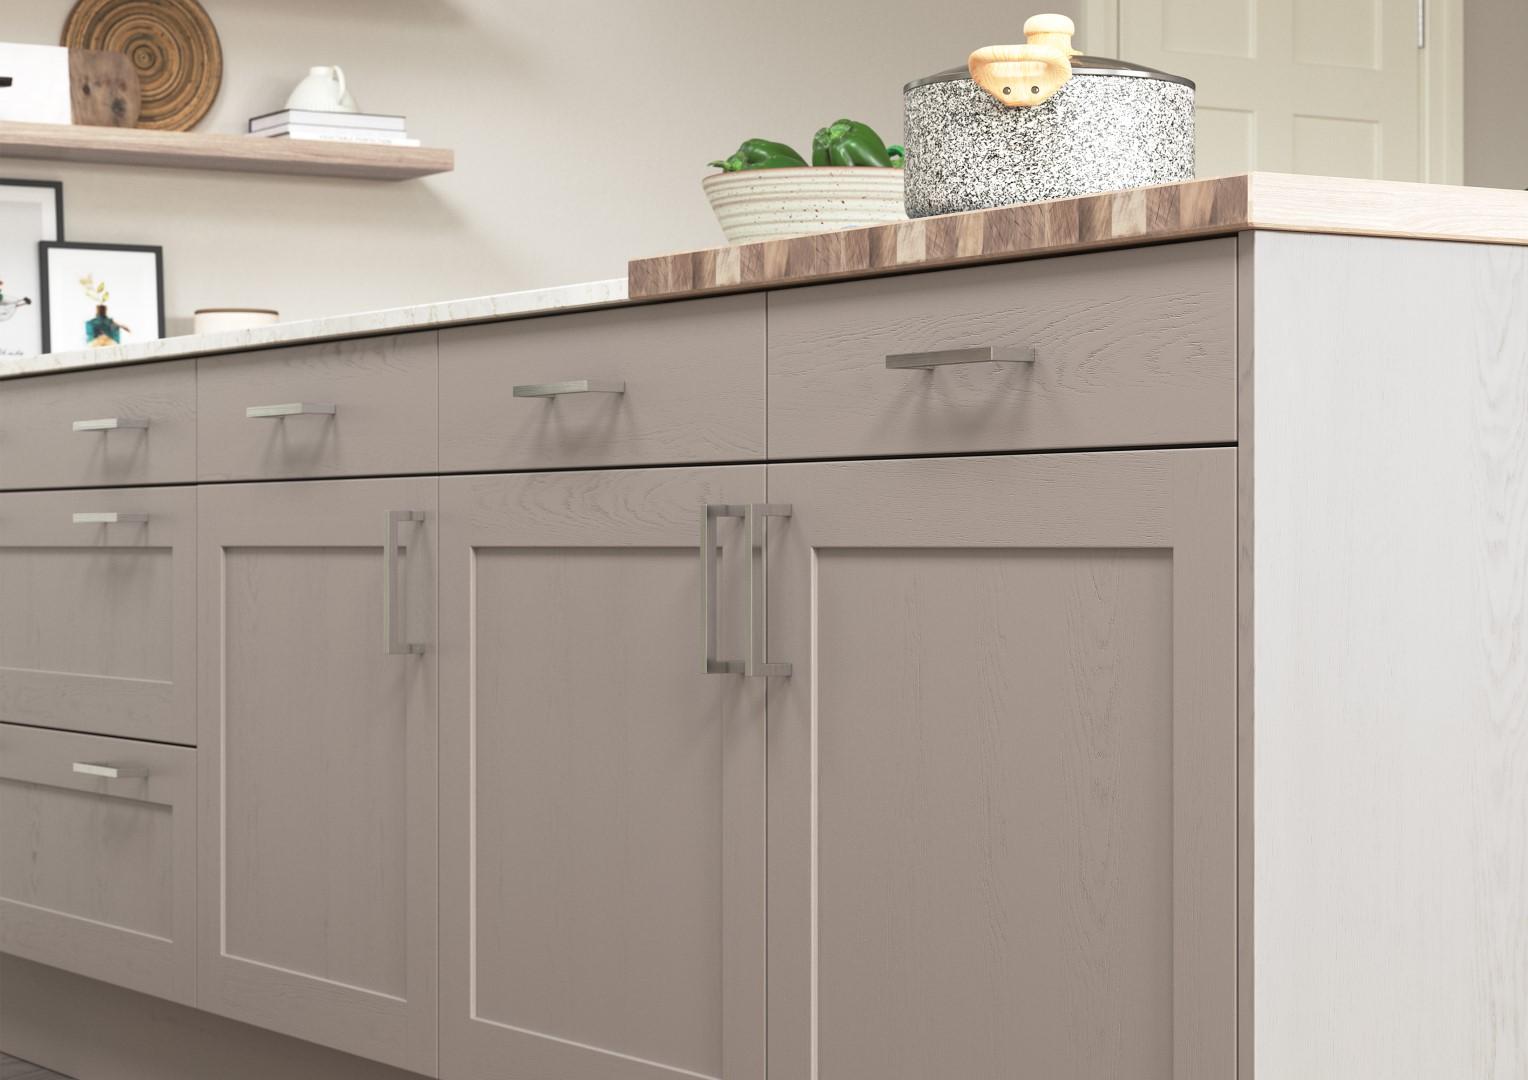 Aldana Porcelain and Cashmere - Kitchen Design - Alan Kelly Kitchens - Waterford - 2